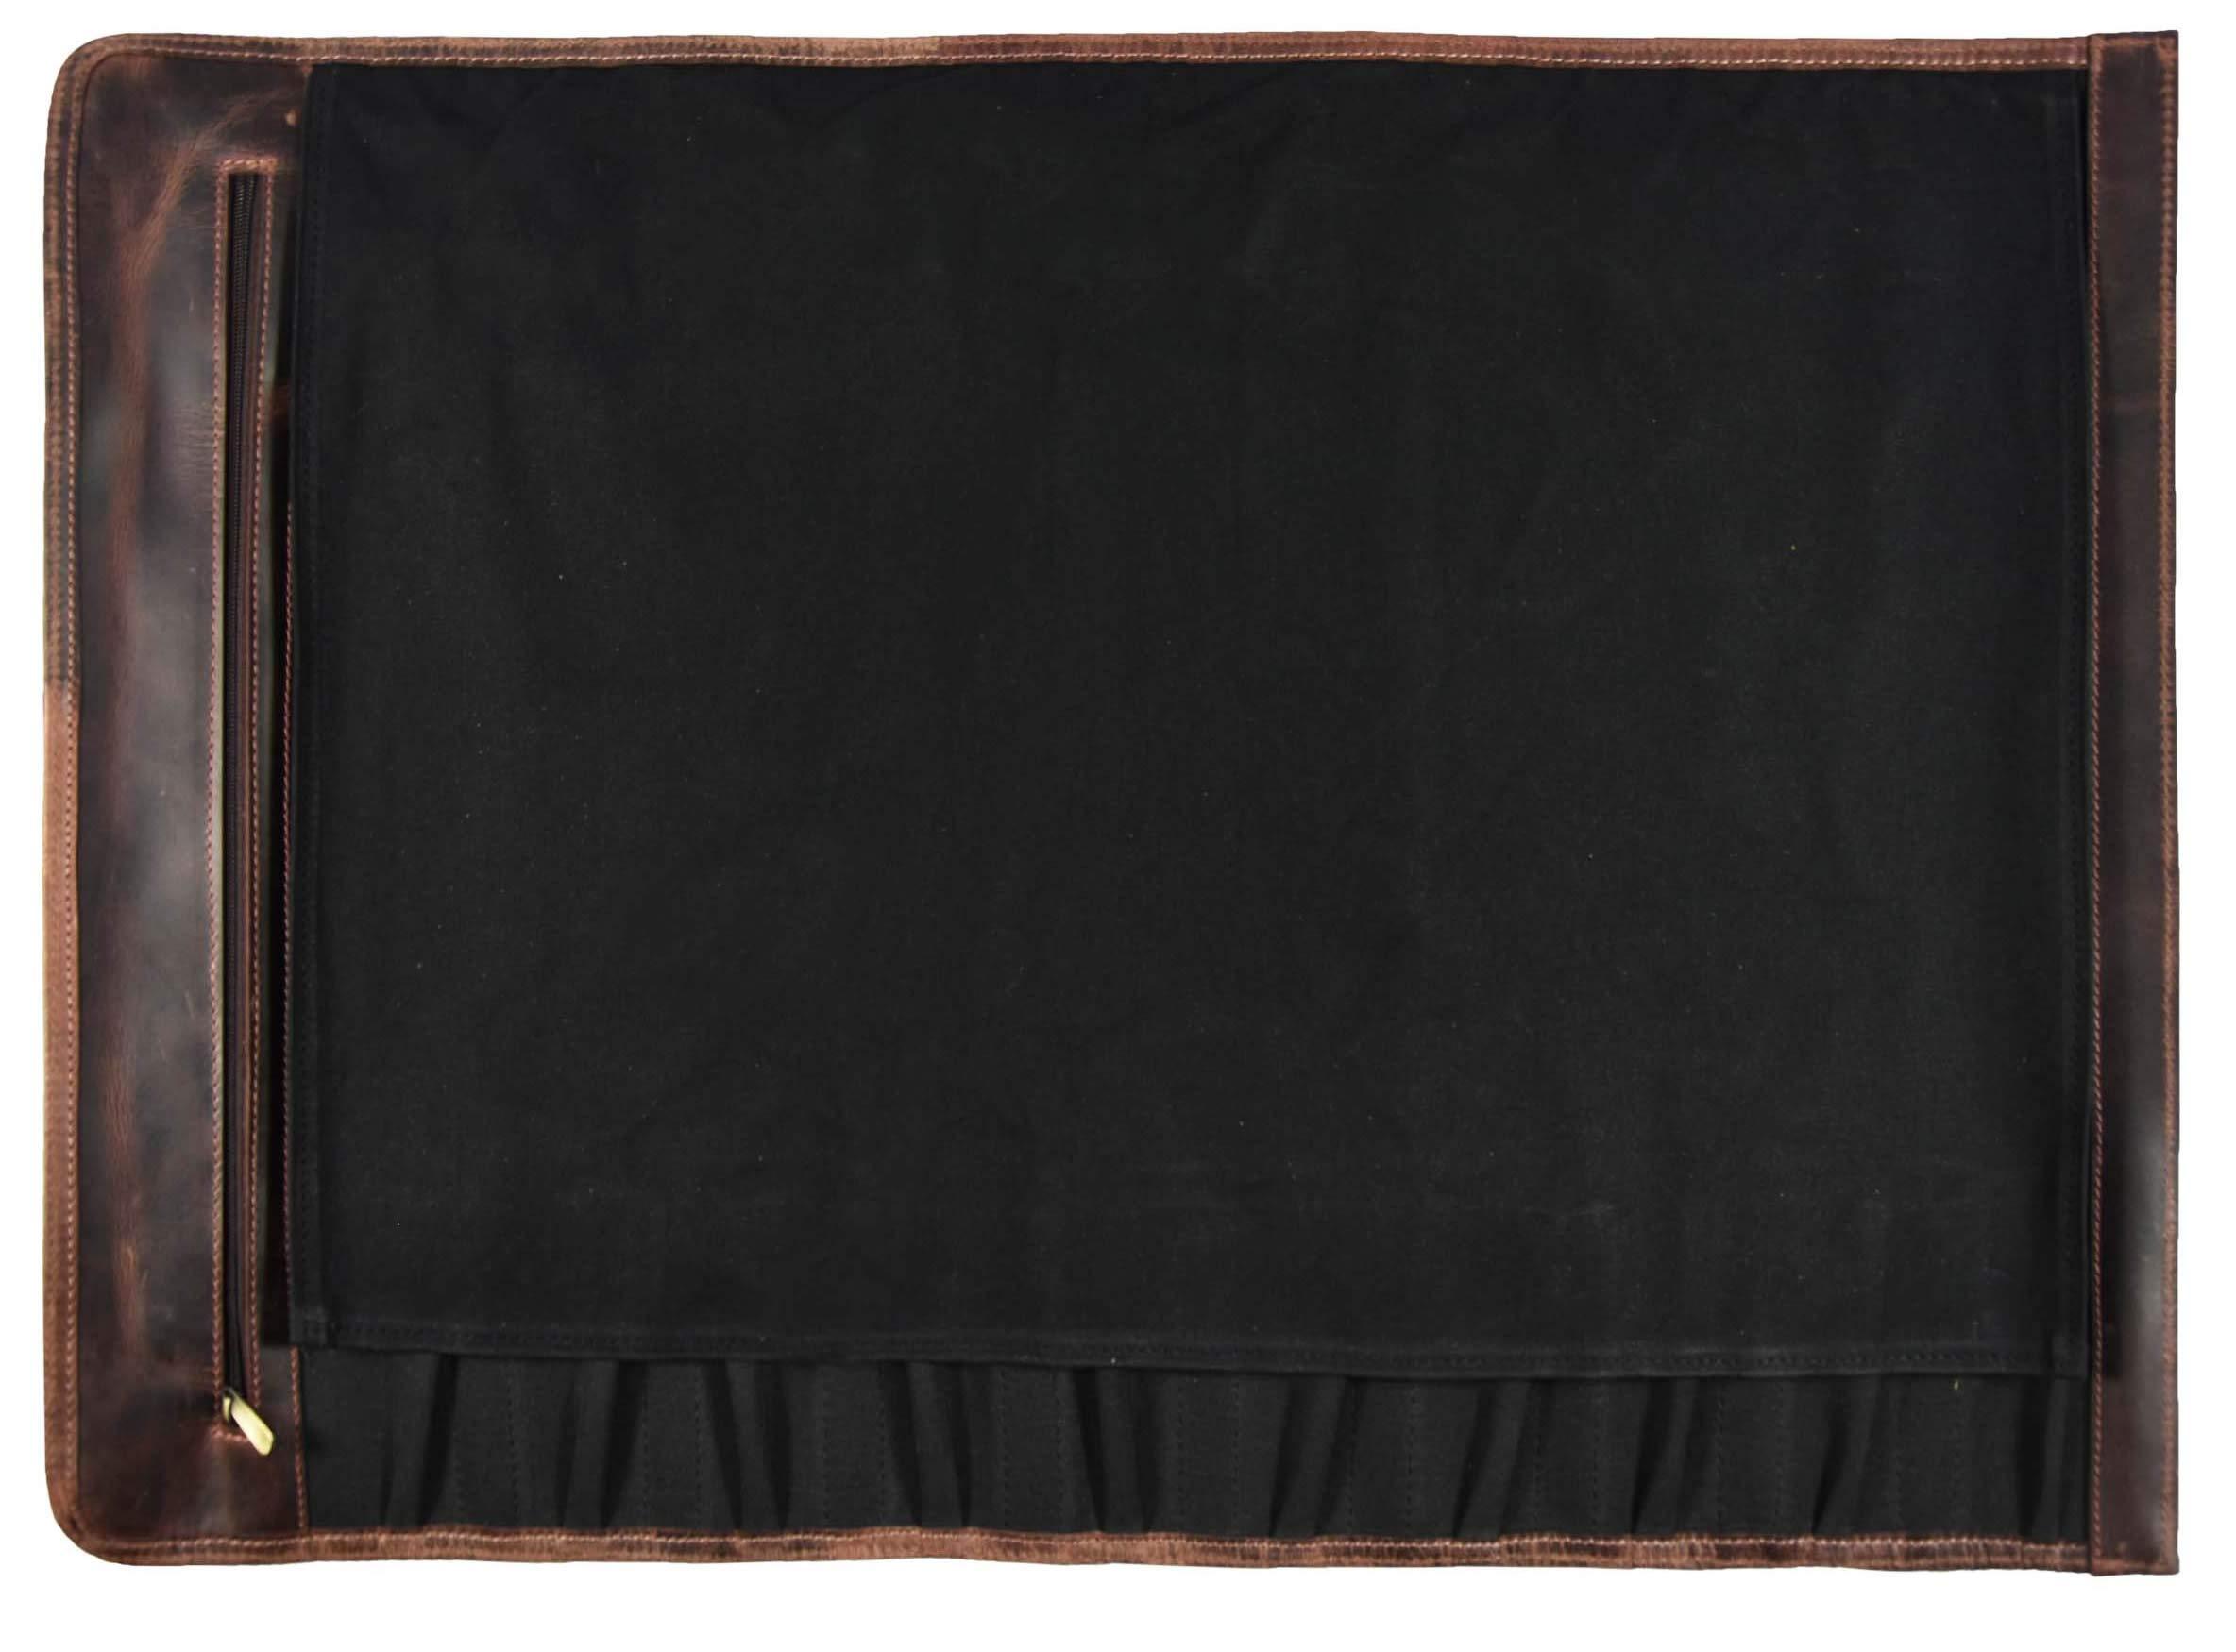 Leather Knife Roll Storage Bag   Elastic and Expandable 10 Pockets   Adjustable/Detachable Shoulder Strap   Travel-Friendly Chef Knife Case Roll By Aaron Leather (Raven, Canvas) by AARON LEATHER GOODS VENDIMIA ESTILO (Image #3)